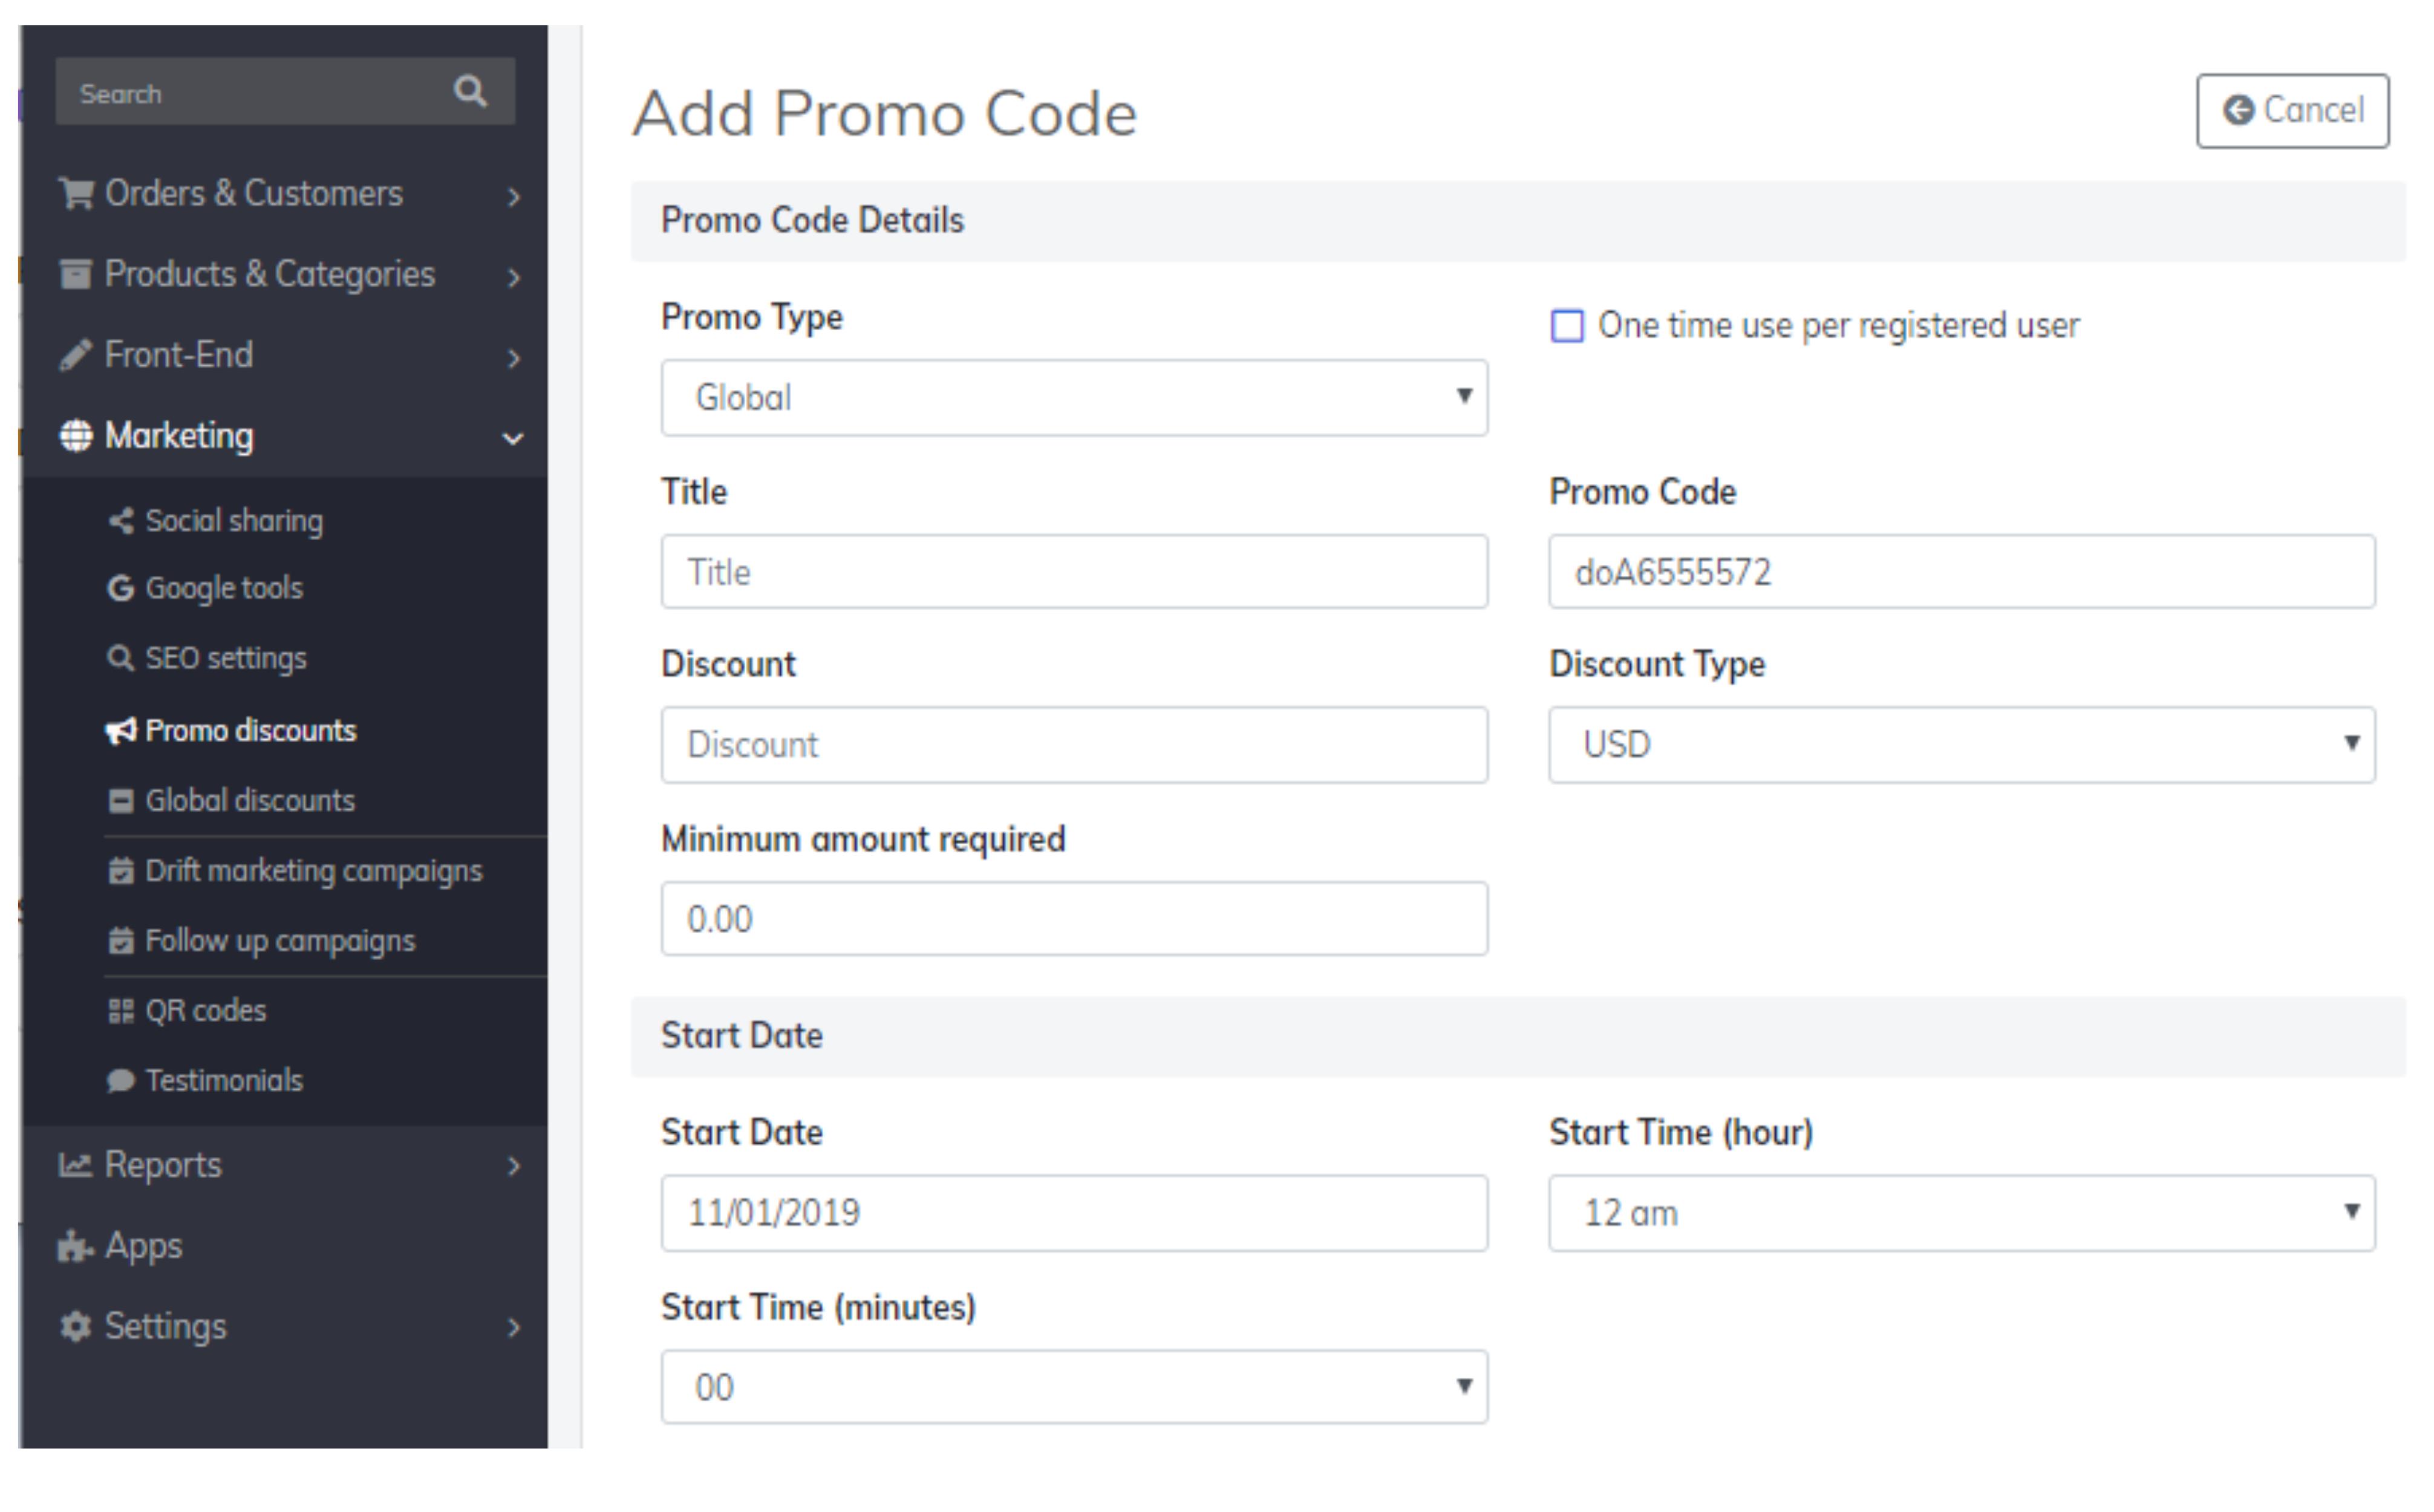 promo code details